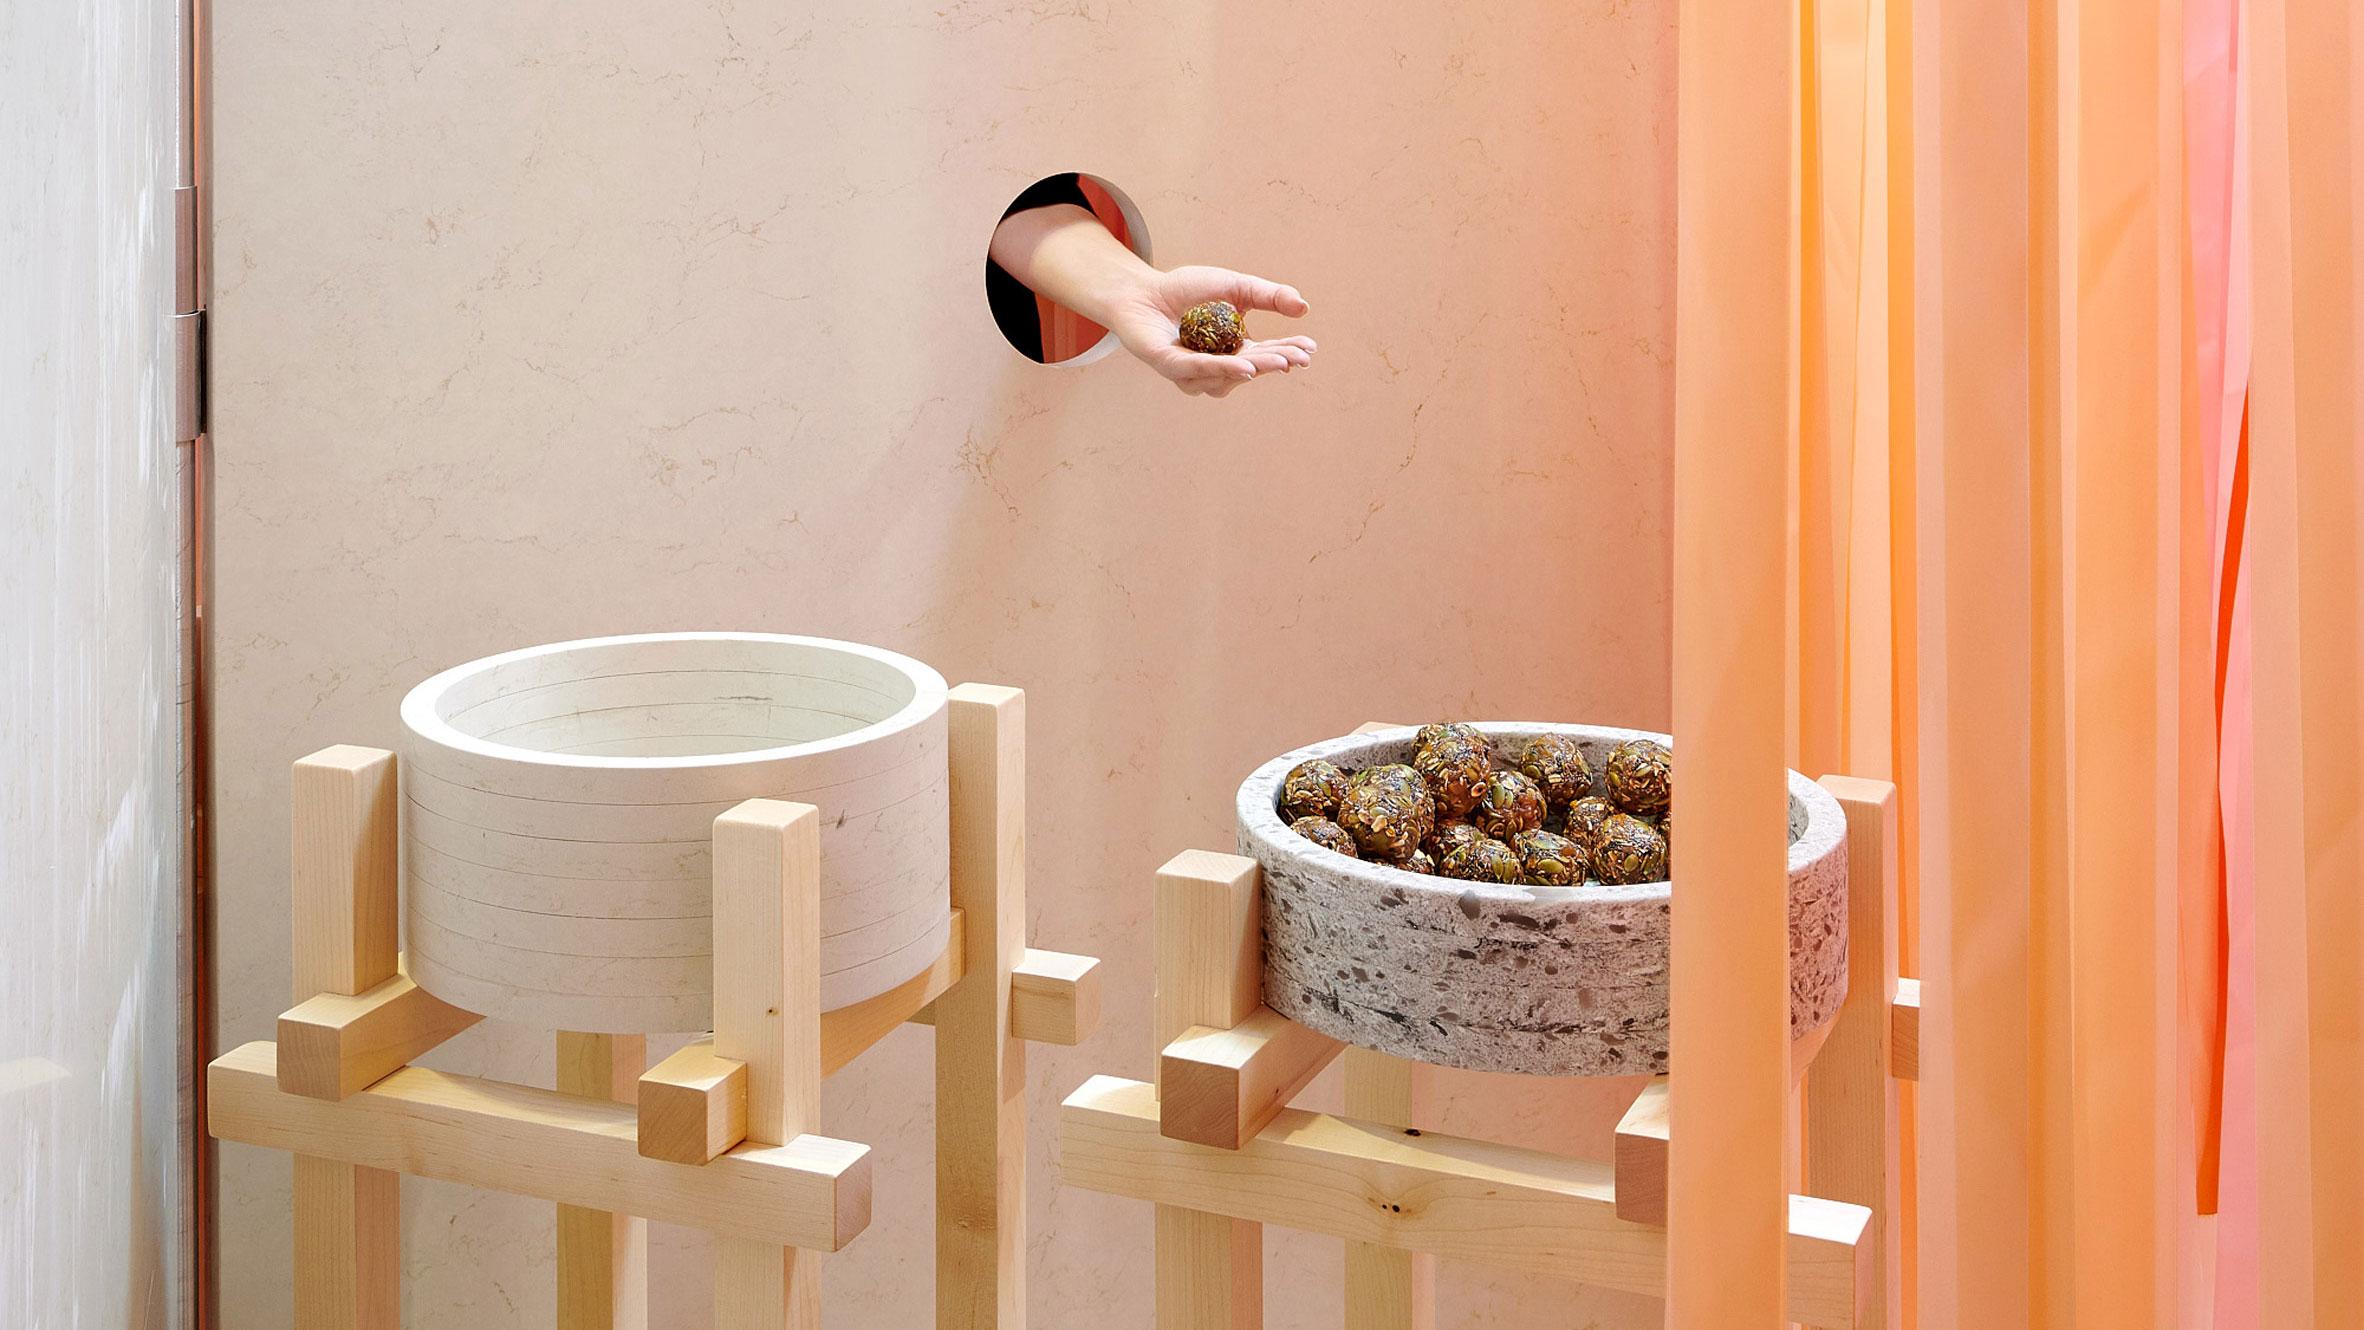 Marije Vogelzang's sensorial installation for Caesarstone